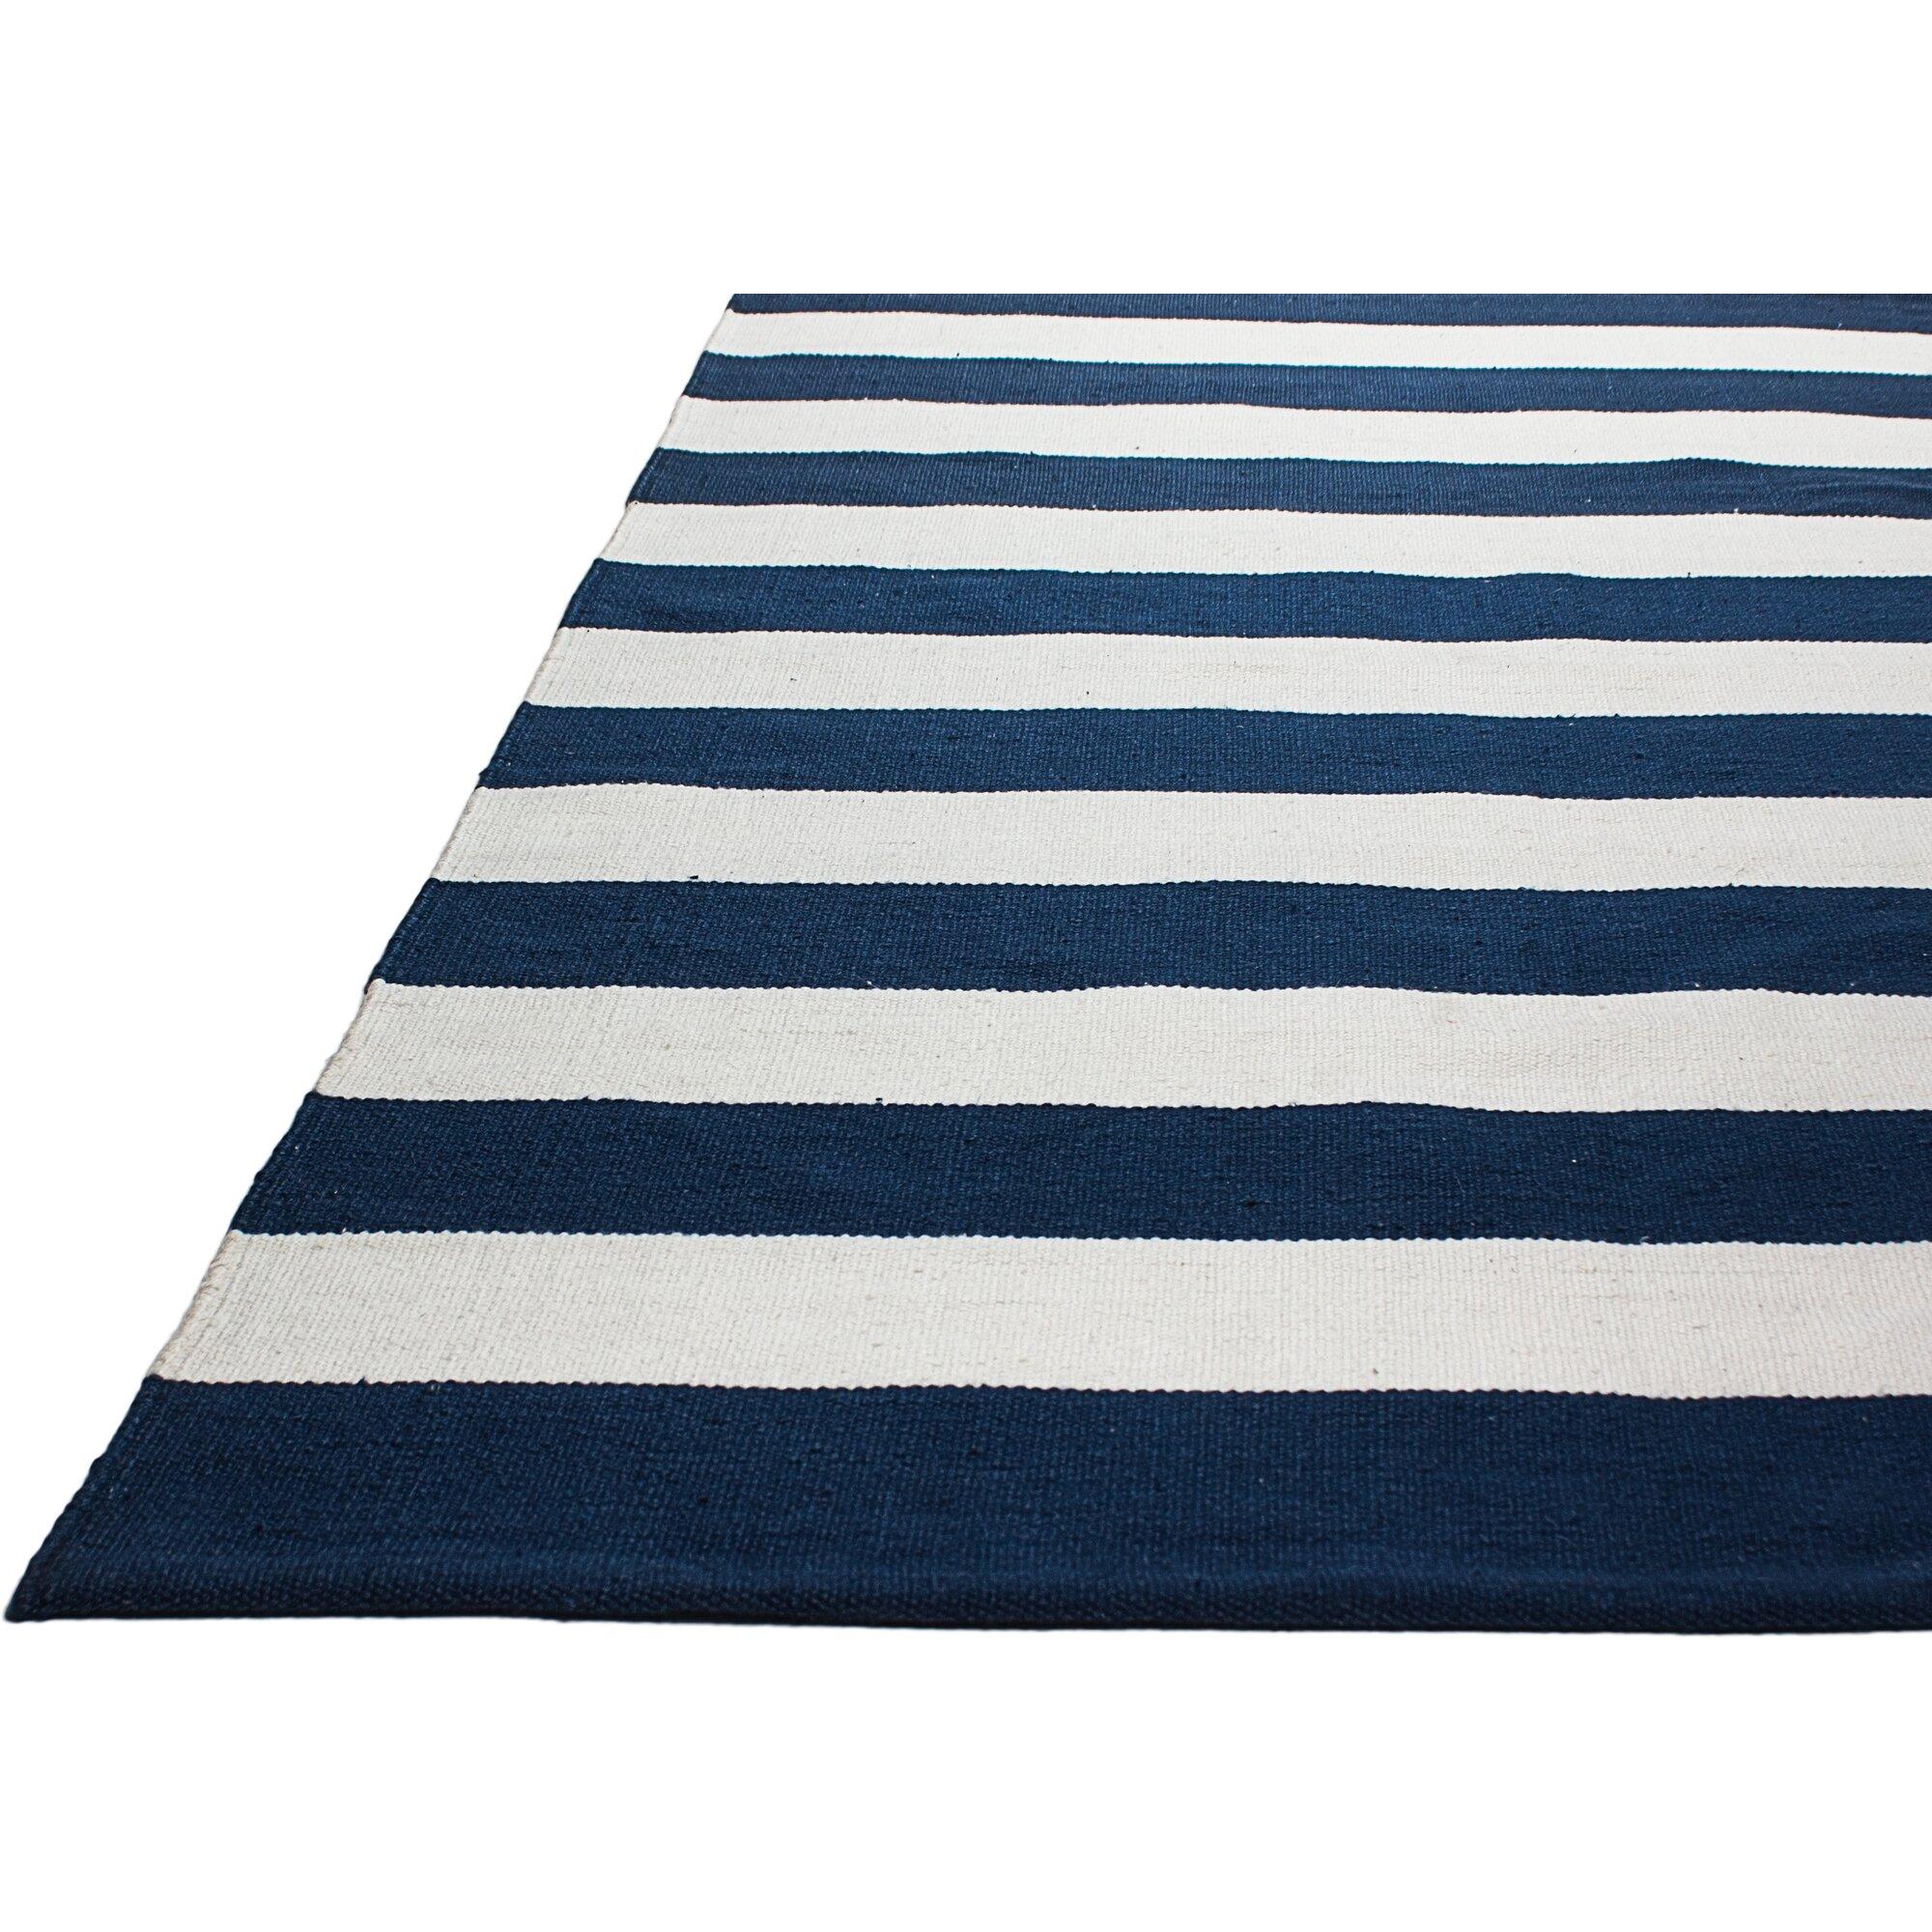 Fab Habitat Nantucket Striped Blue u0026 White Indoor/Outdoor Area Rug u0026 Reviews : Wayfair